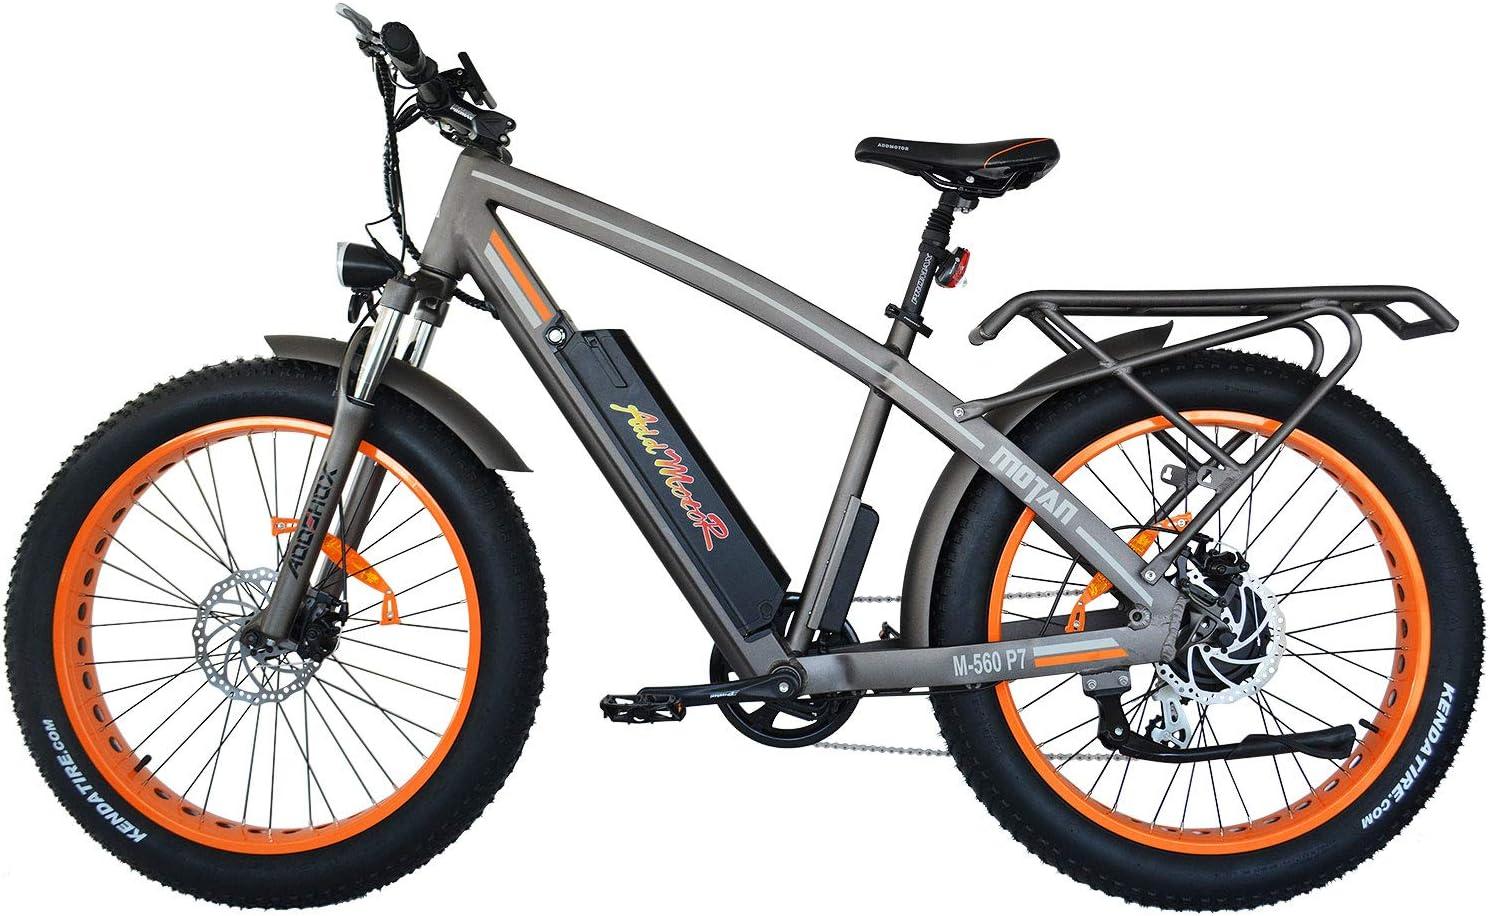 Addmotor Fat Tire 26 Inch 750W Power Electric Mountain Bike